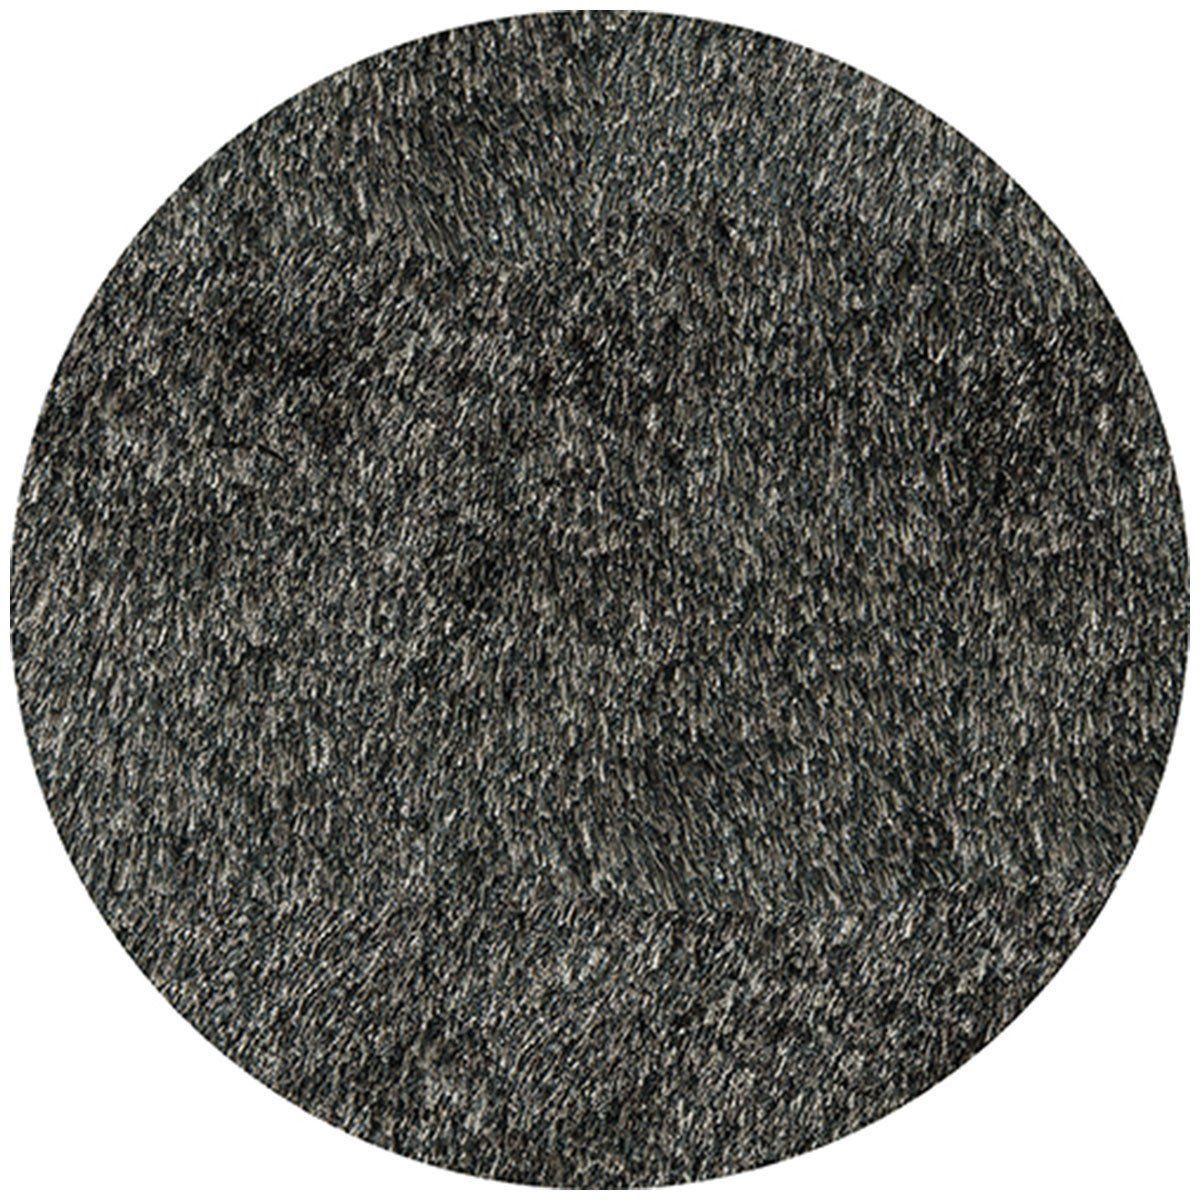 Momeni Rug Hand Tufted Carbon LSHAGLS-01CAR